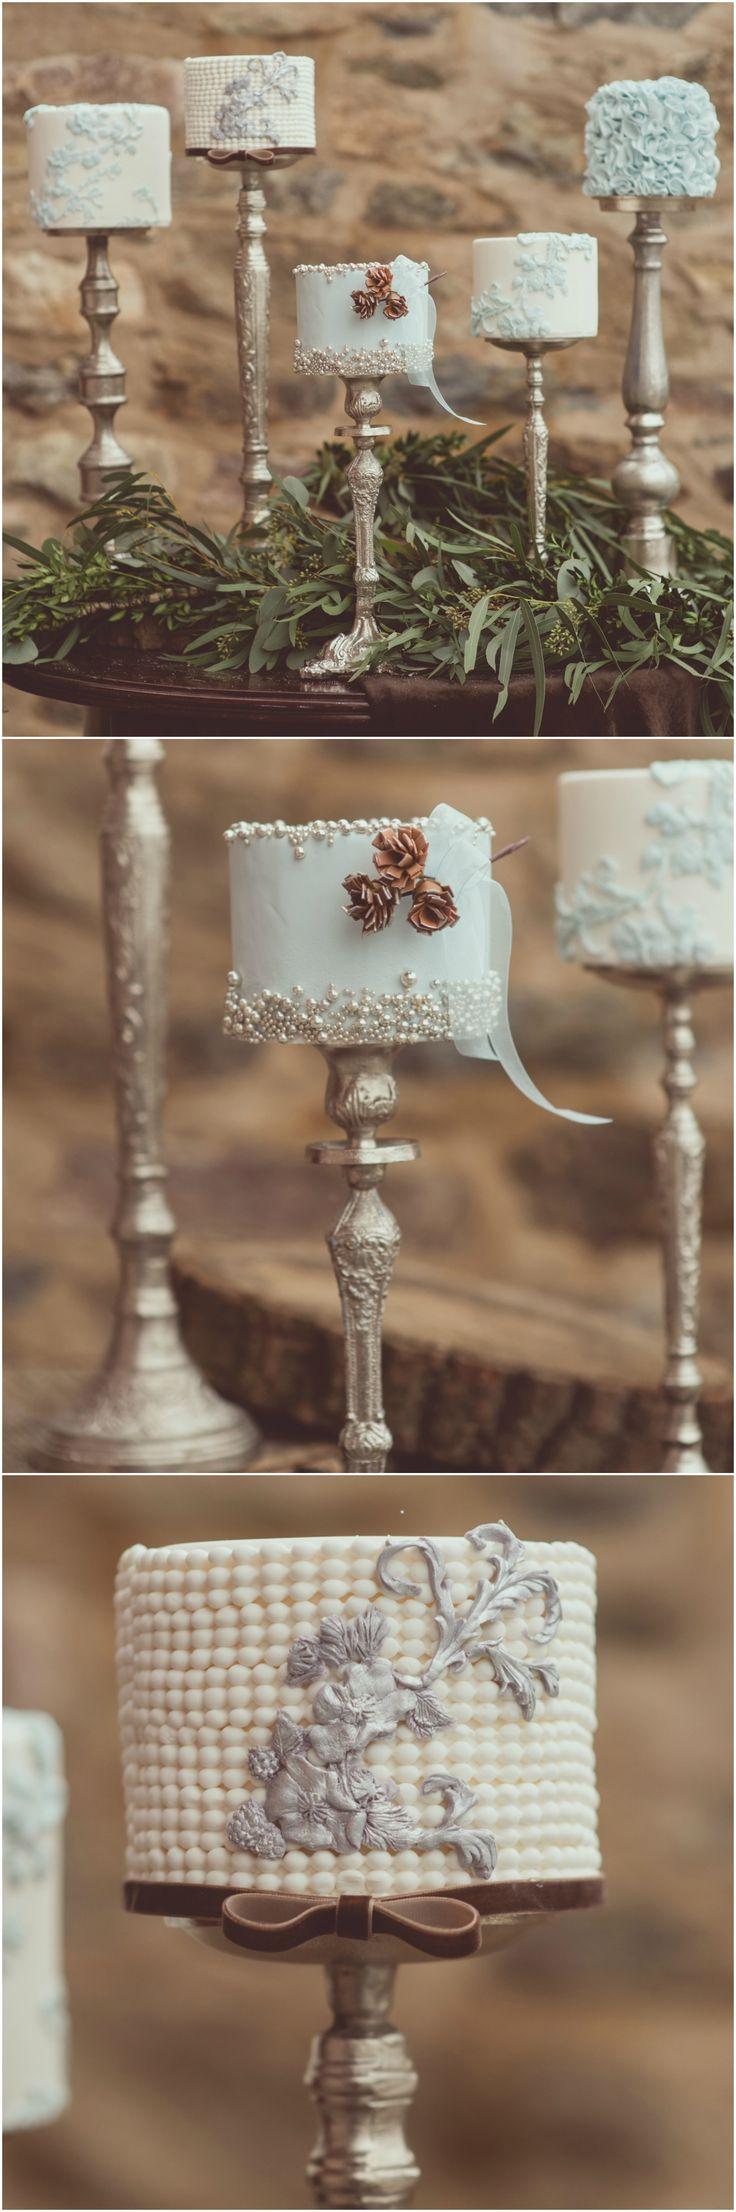 Petite wedding cakes, bronze candlesticks, edible pearls, lightest pastel blue fondant, light gray cutouts // Carla Ten Eyck Photography